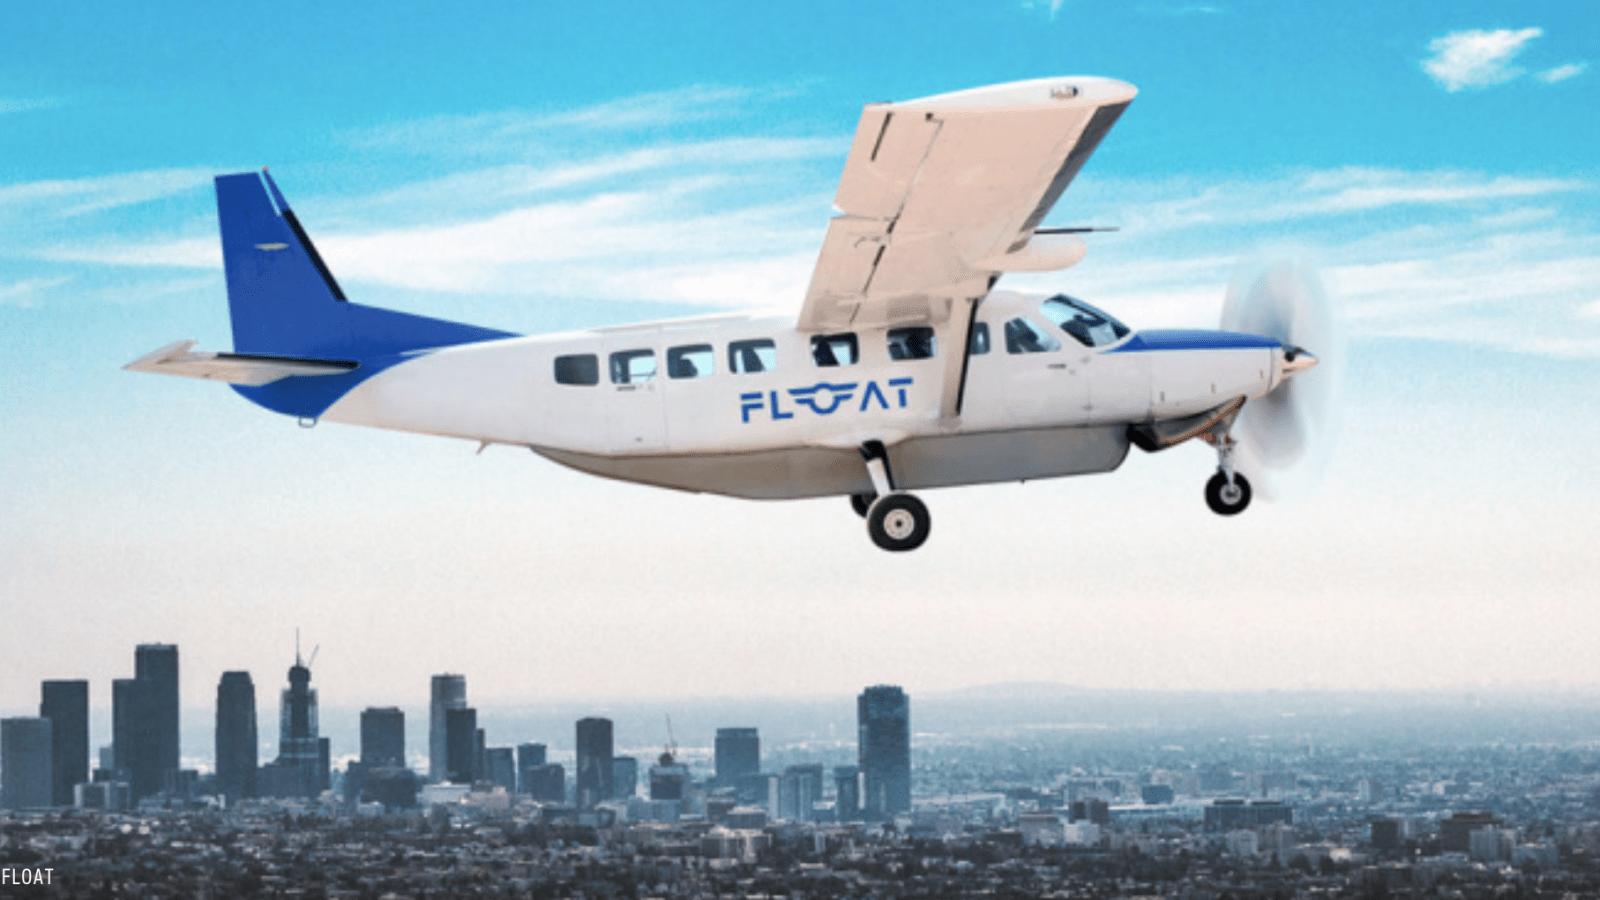 FLOAT commute plane